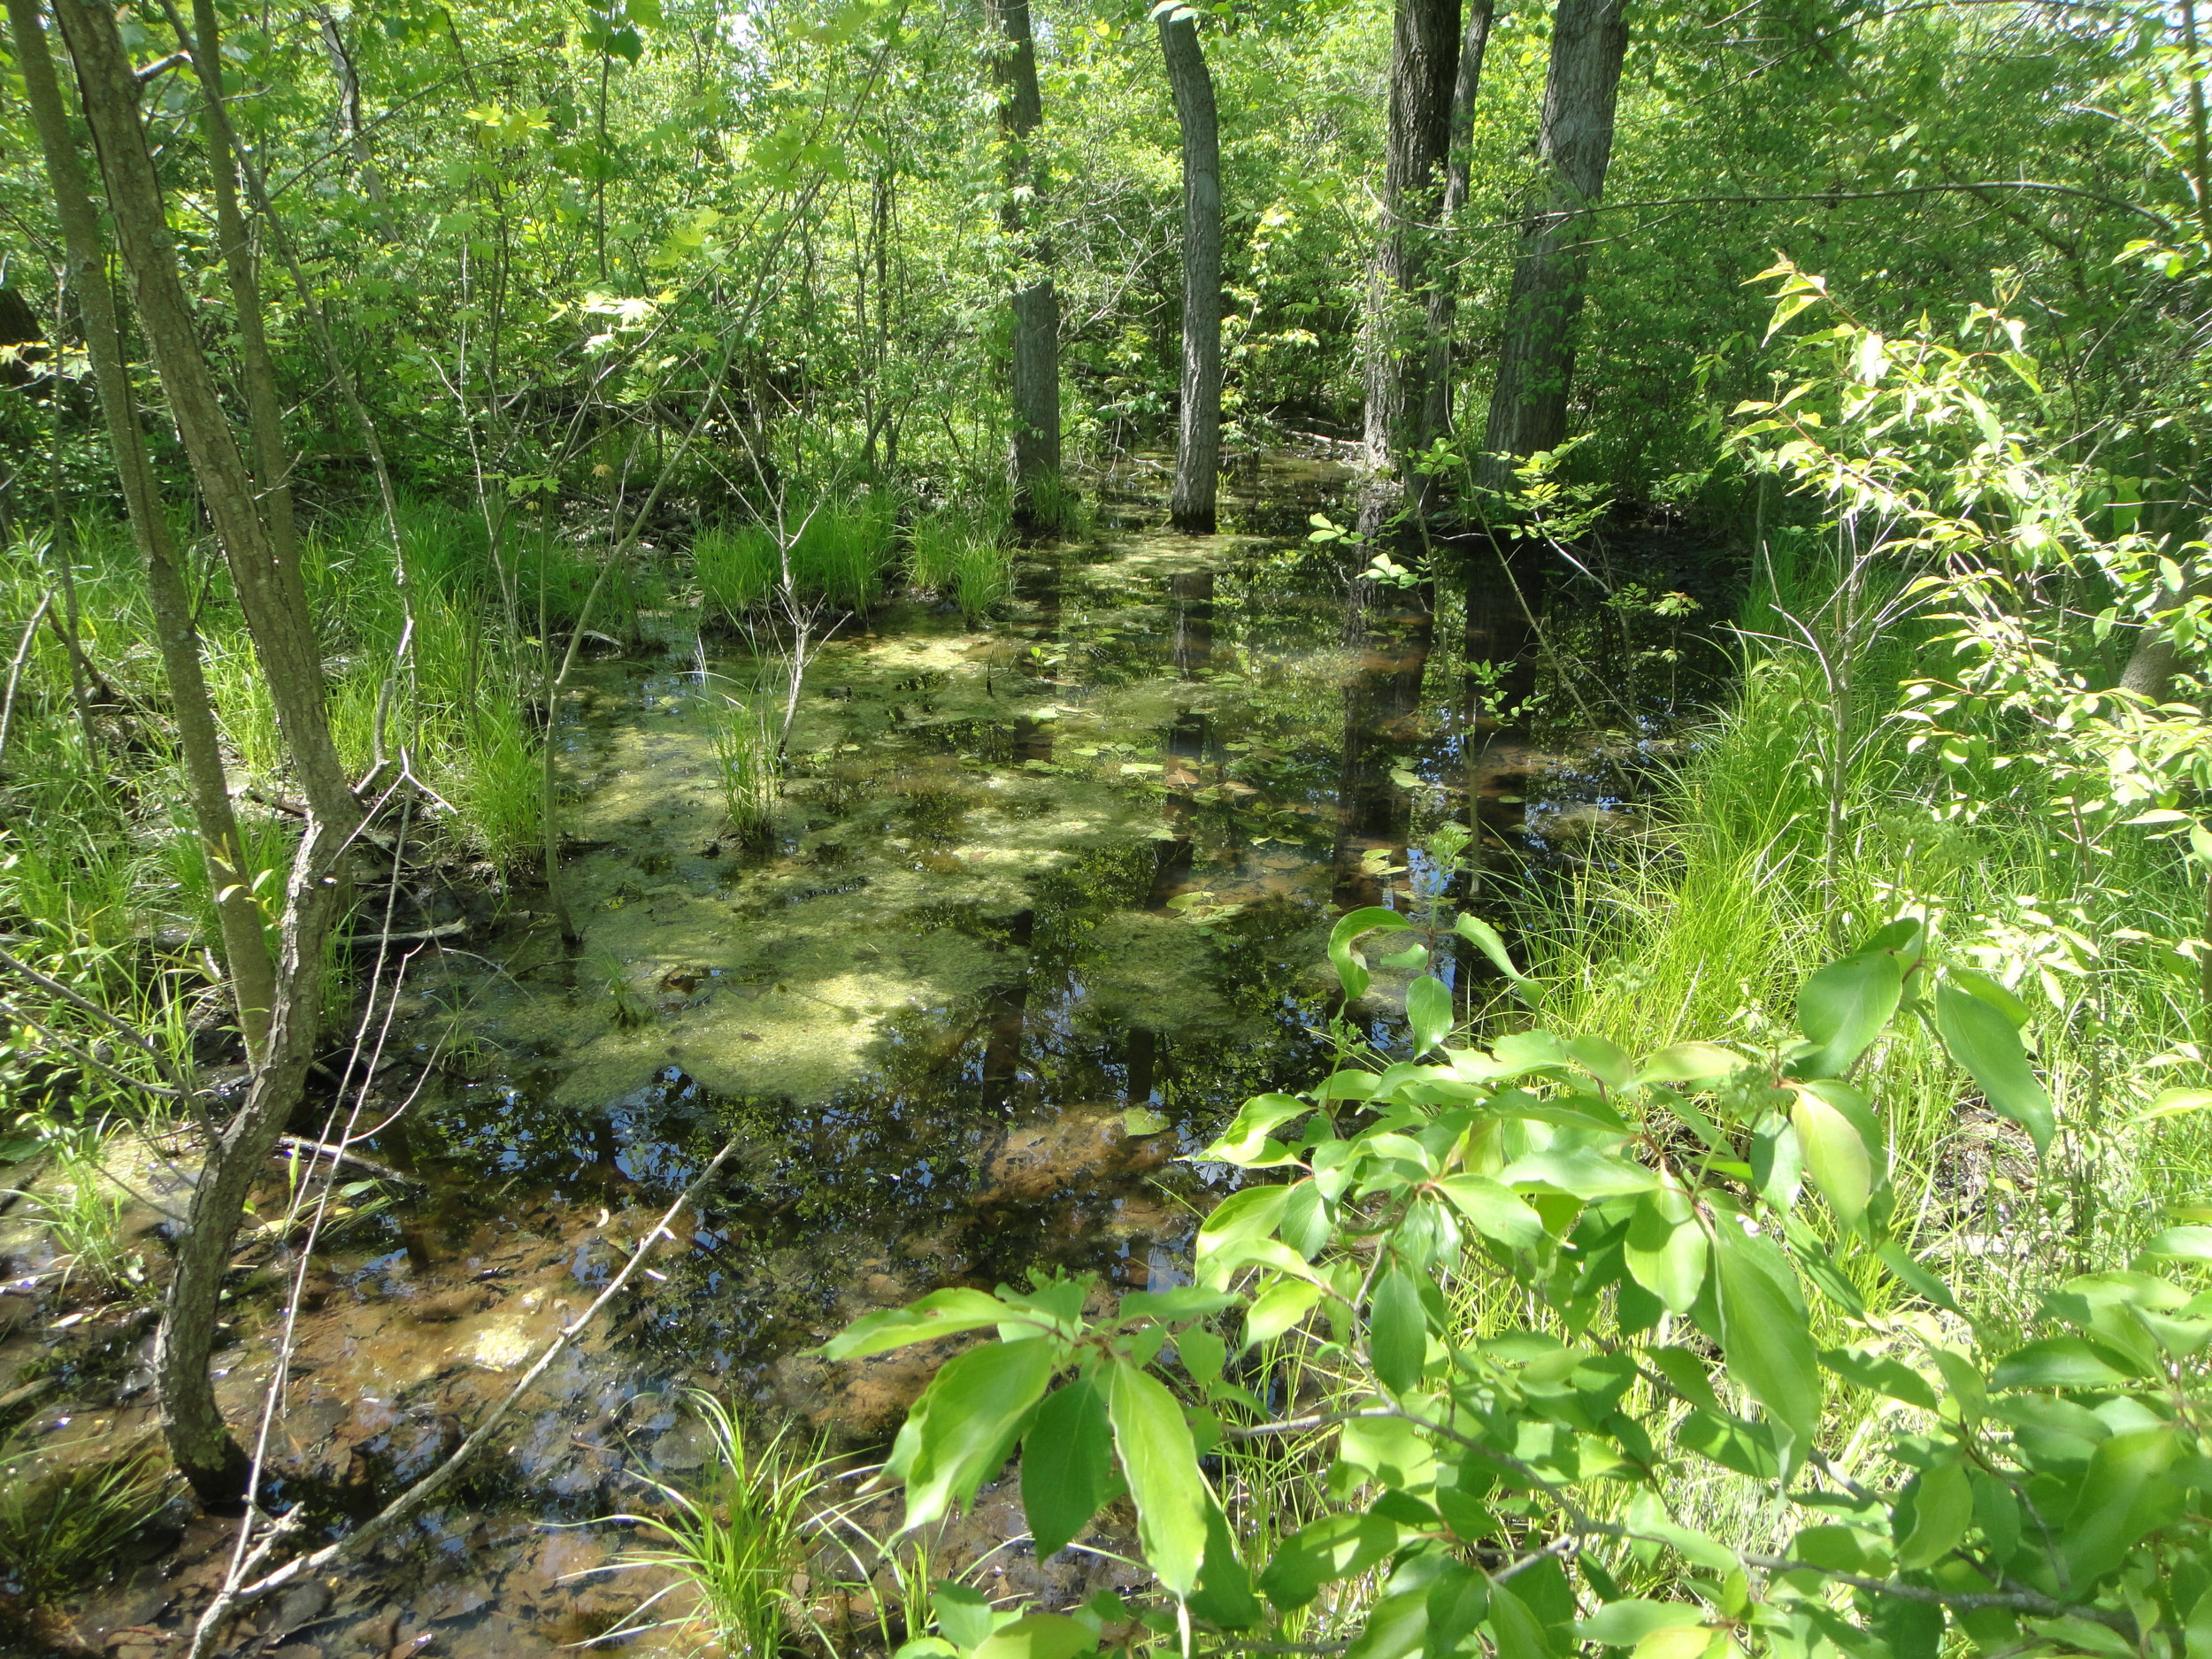 May is American Wetlands Month - Will Shealy, Intern, VET Environmental Engineering, LLCGrace Miller, Environmental Scientist, VET Environmental Engineering, LLC